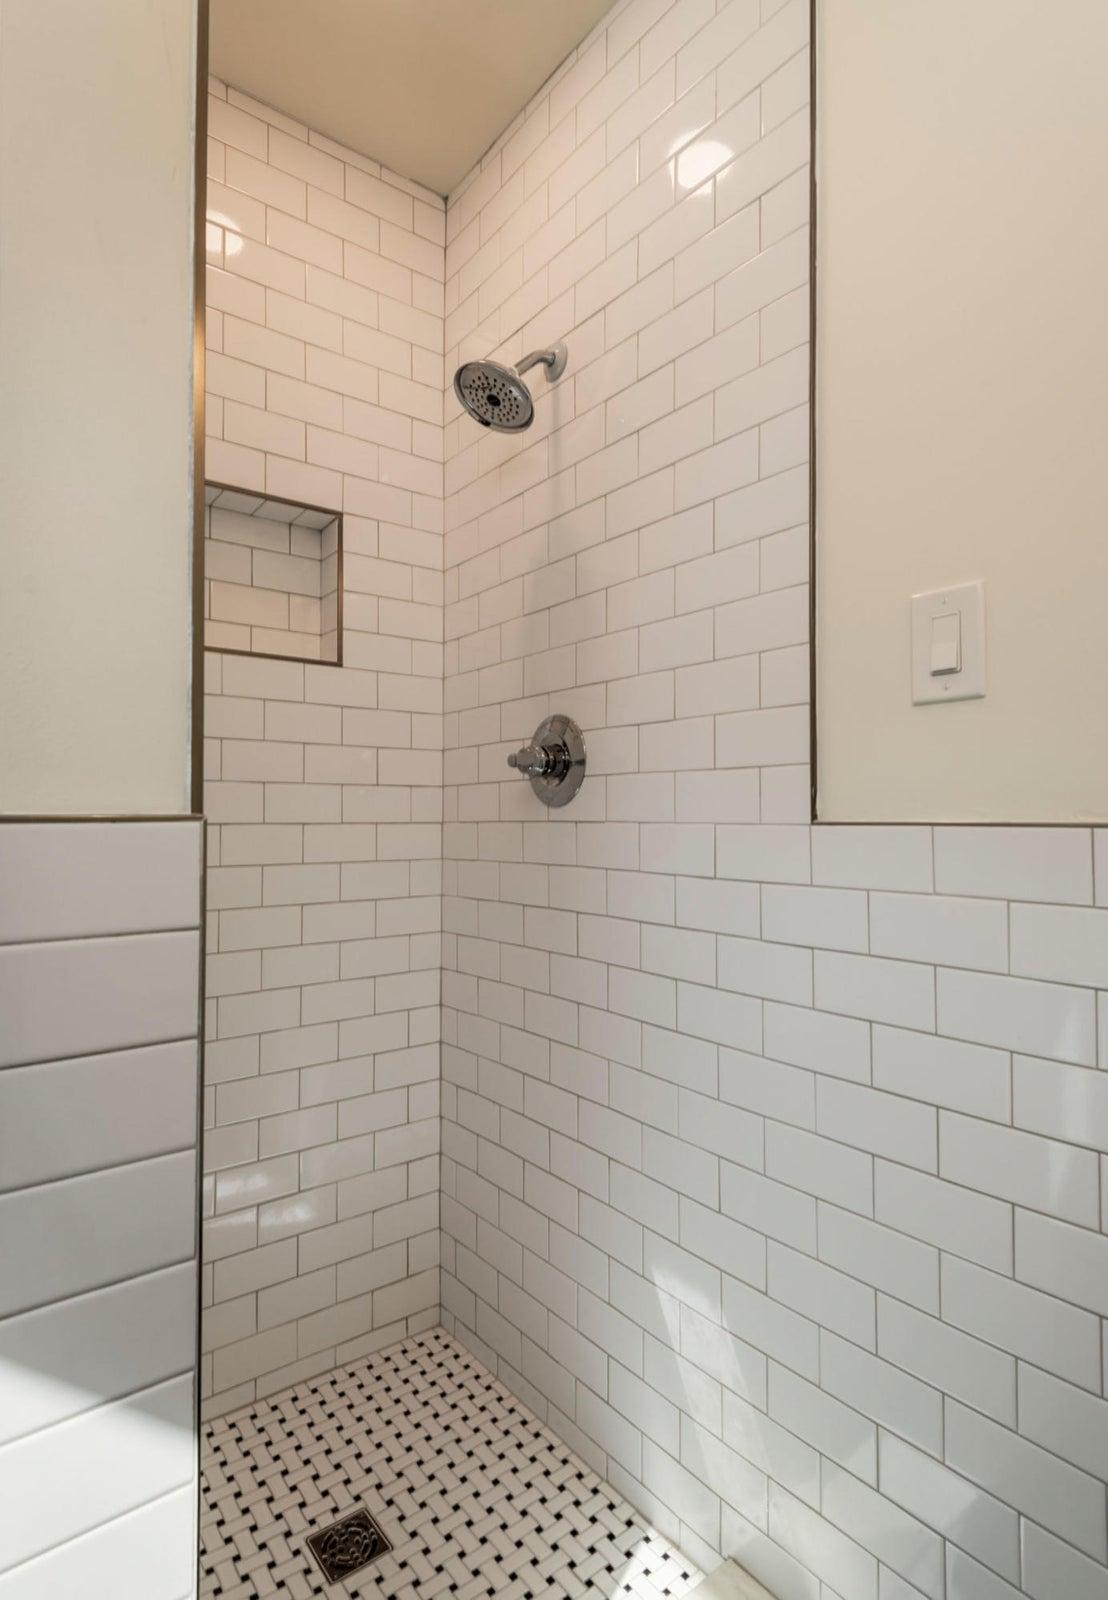 Owners Suite Bathroom View 2